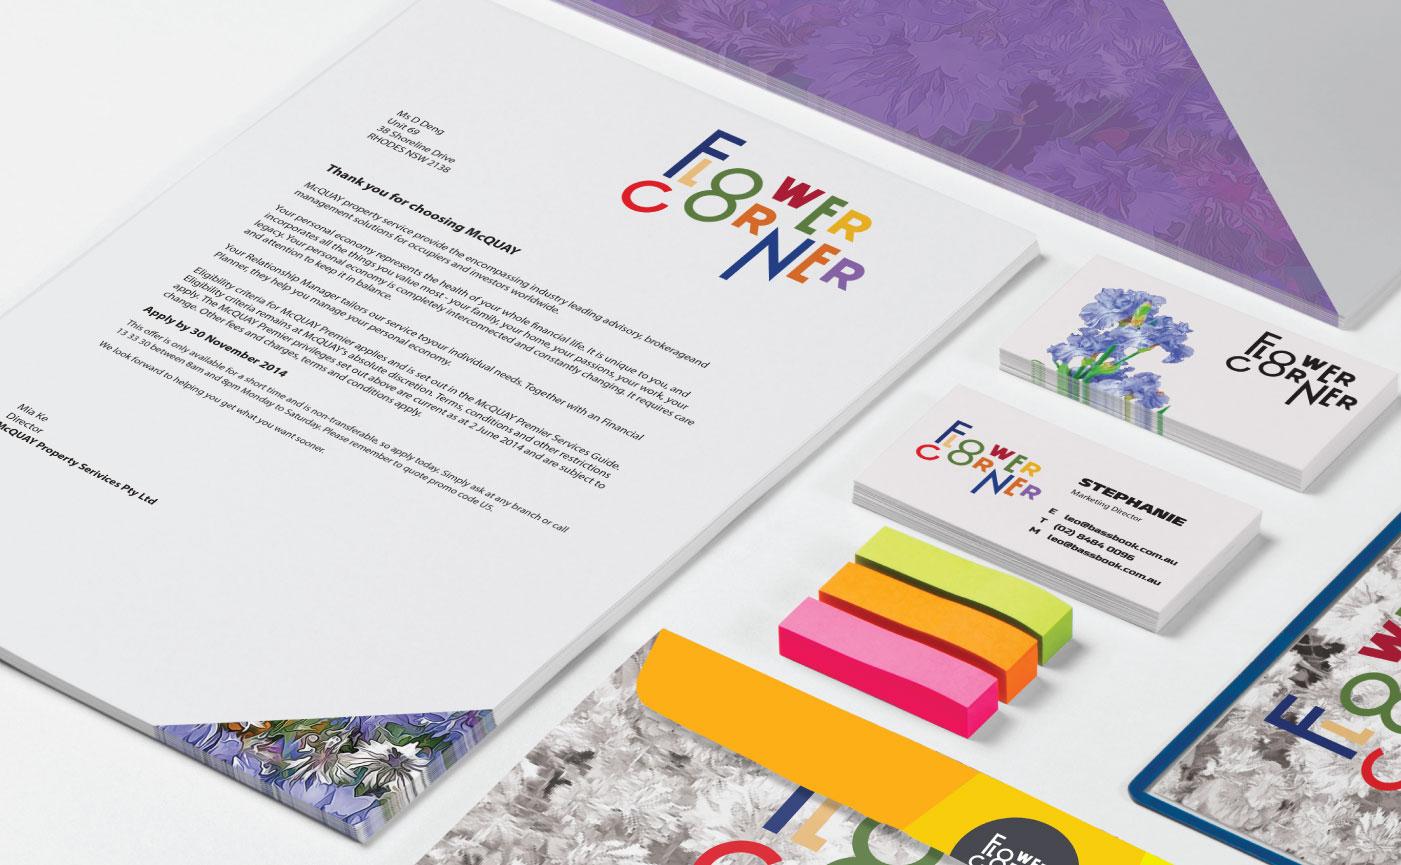 Flowercorner-brand-web-design-4